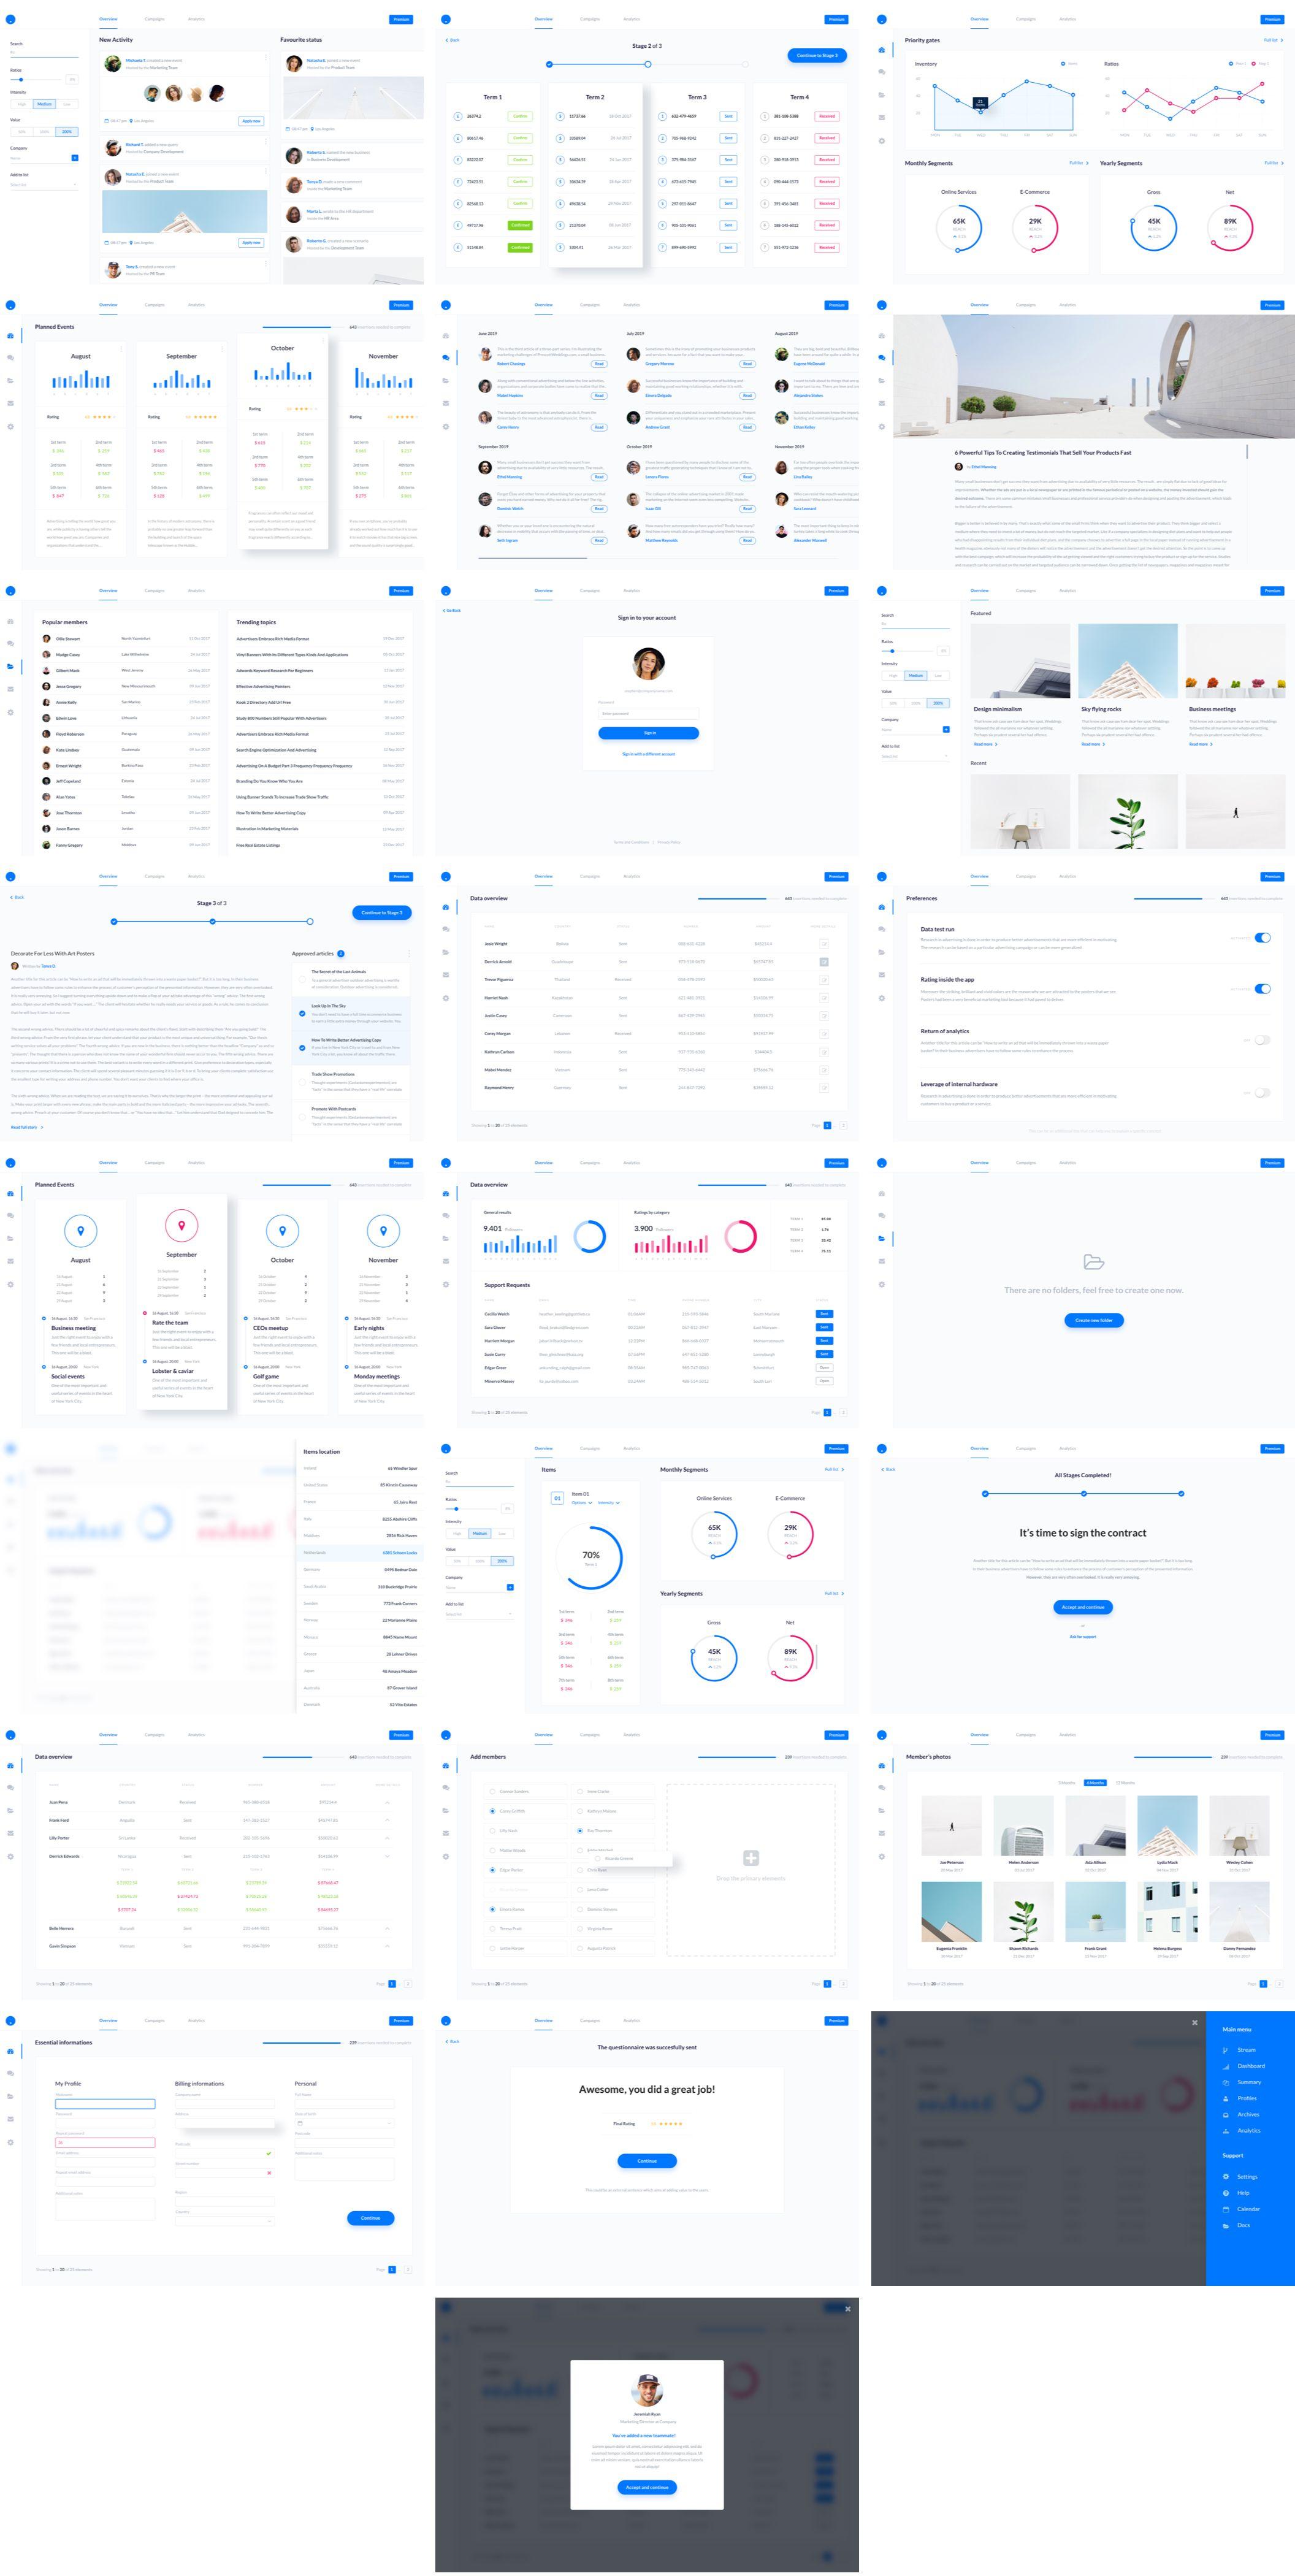 Web SaaS Dashboard UI Kit — UI Kits on UI8 | Admin | Dashboard ui